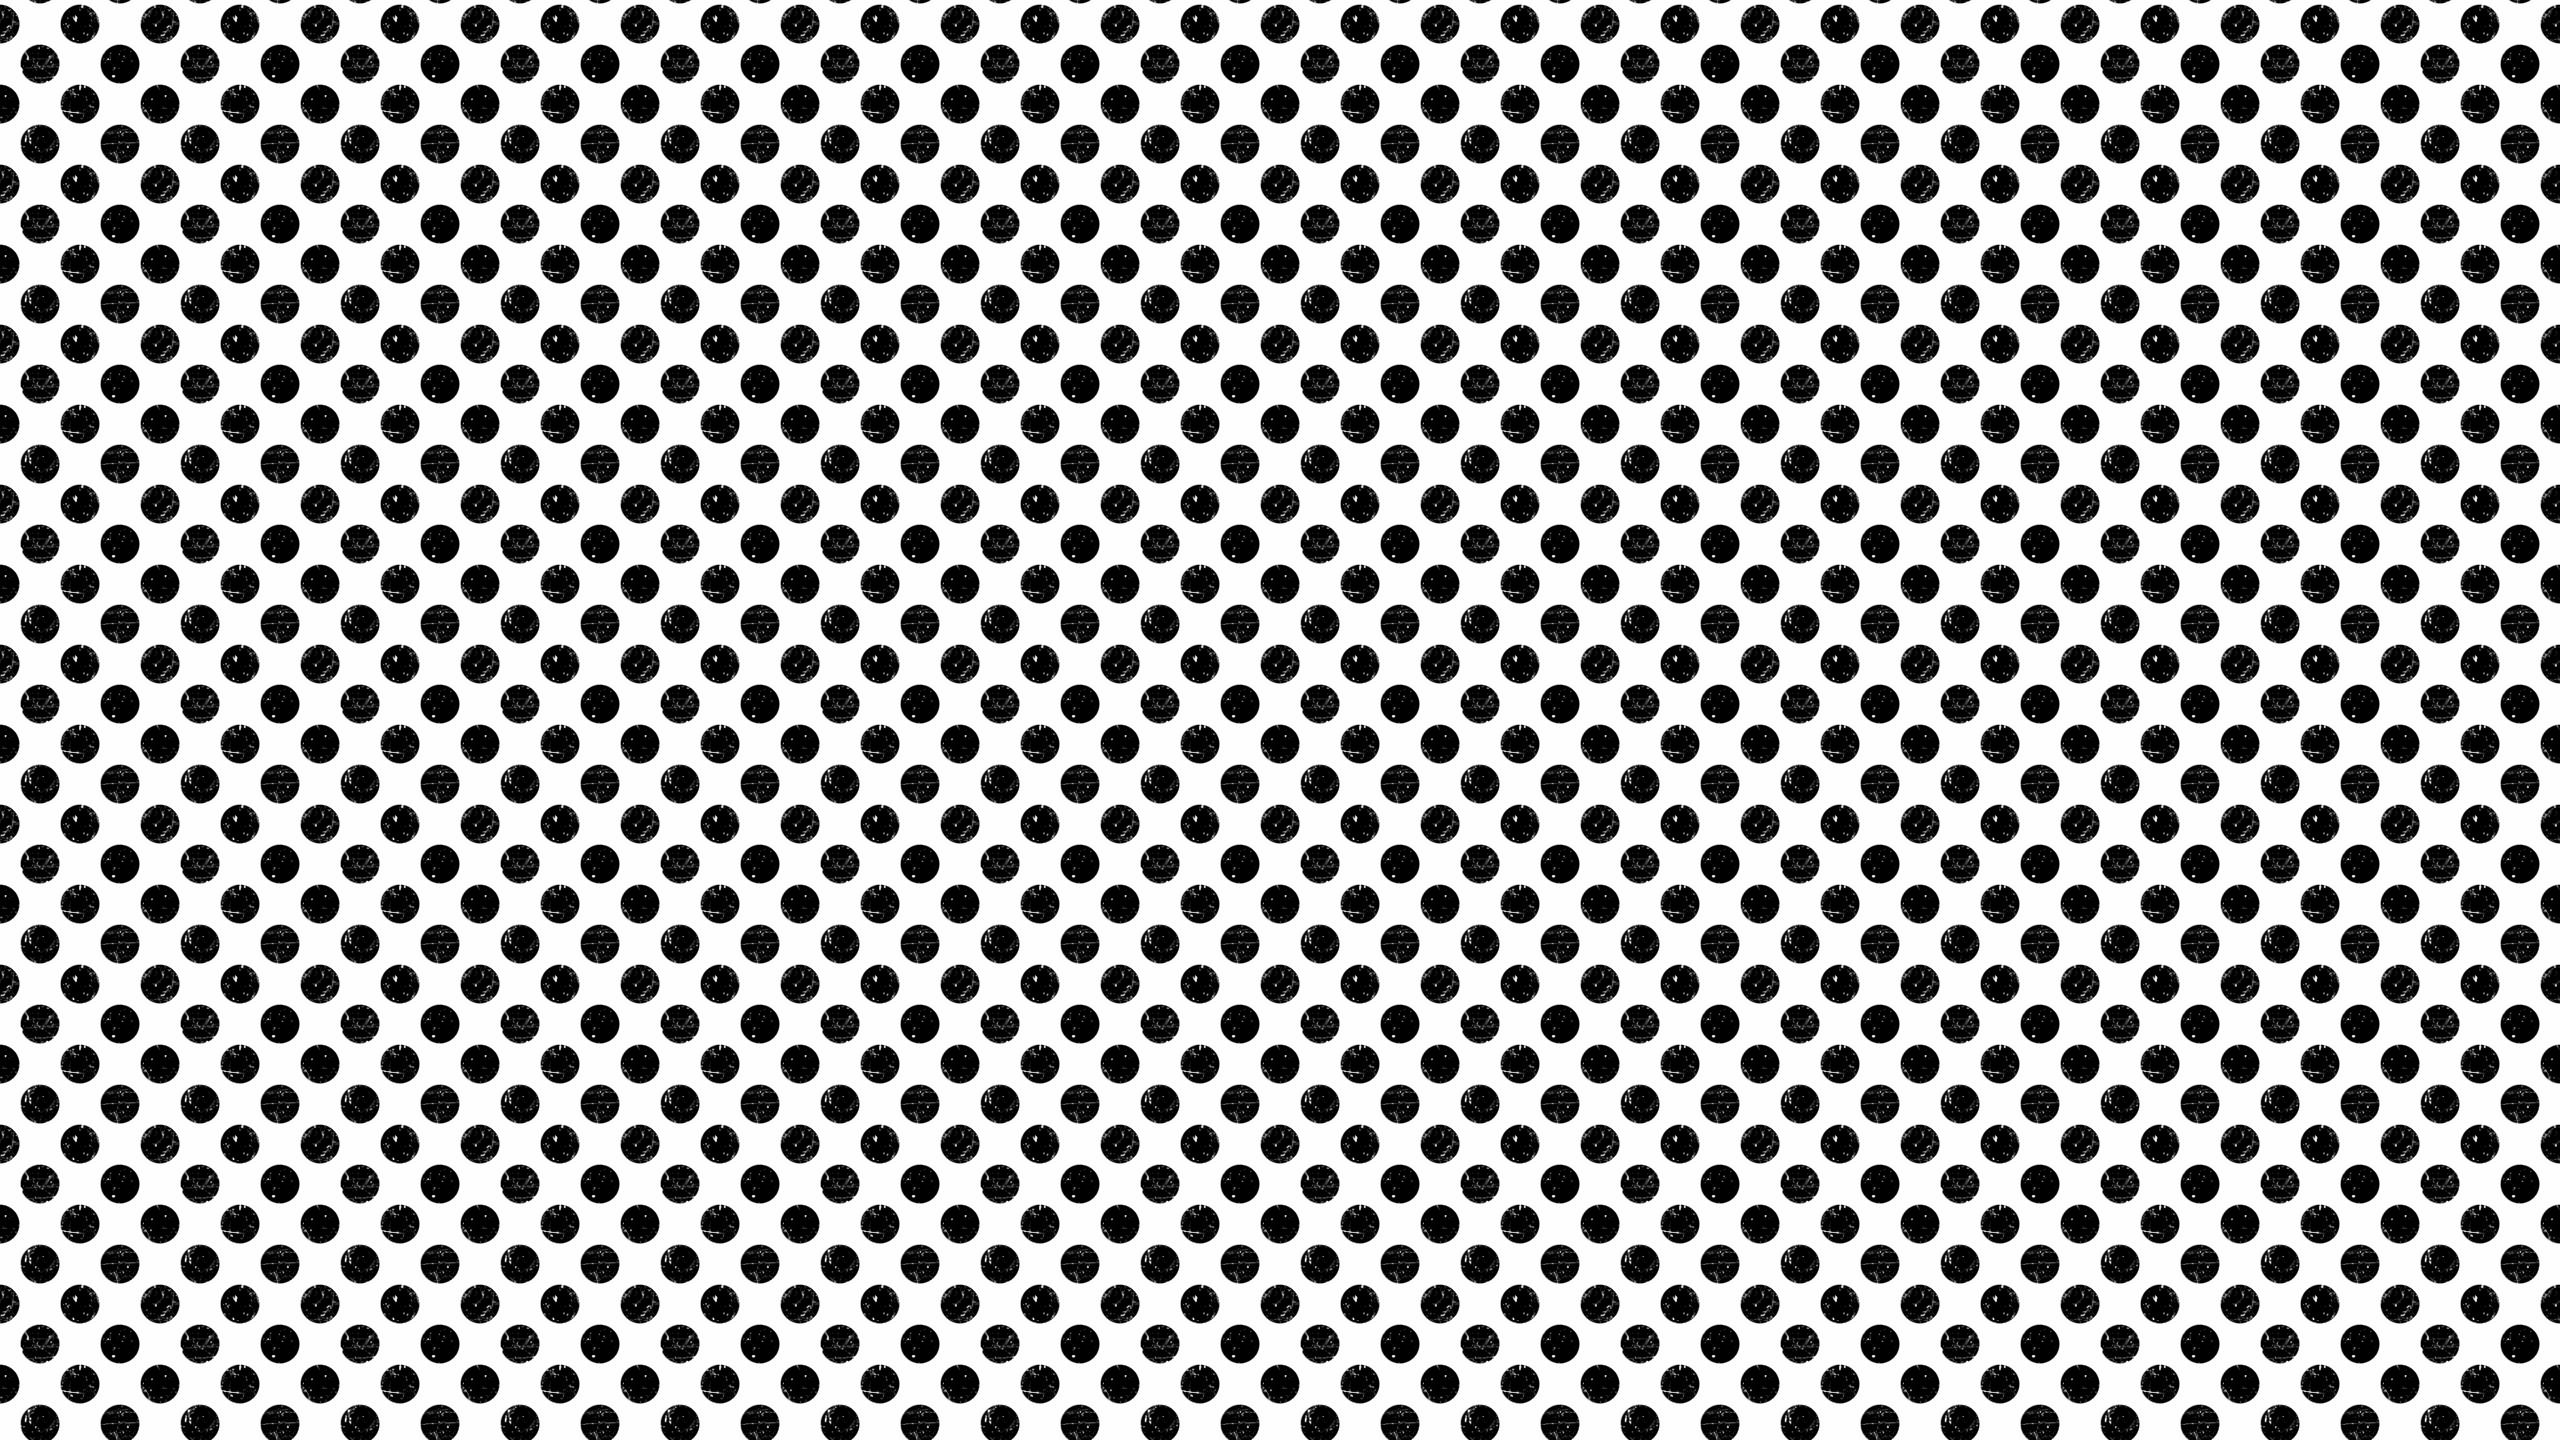 Black And White Dot Wallpaper 76 Images